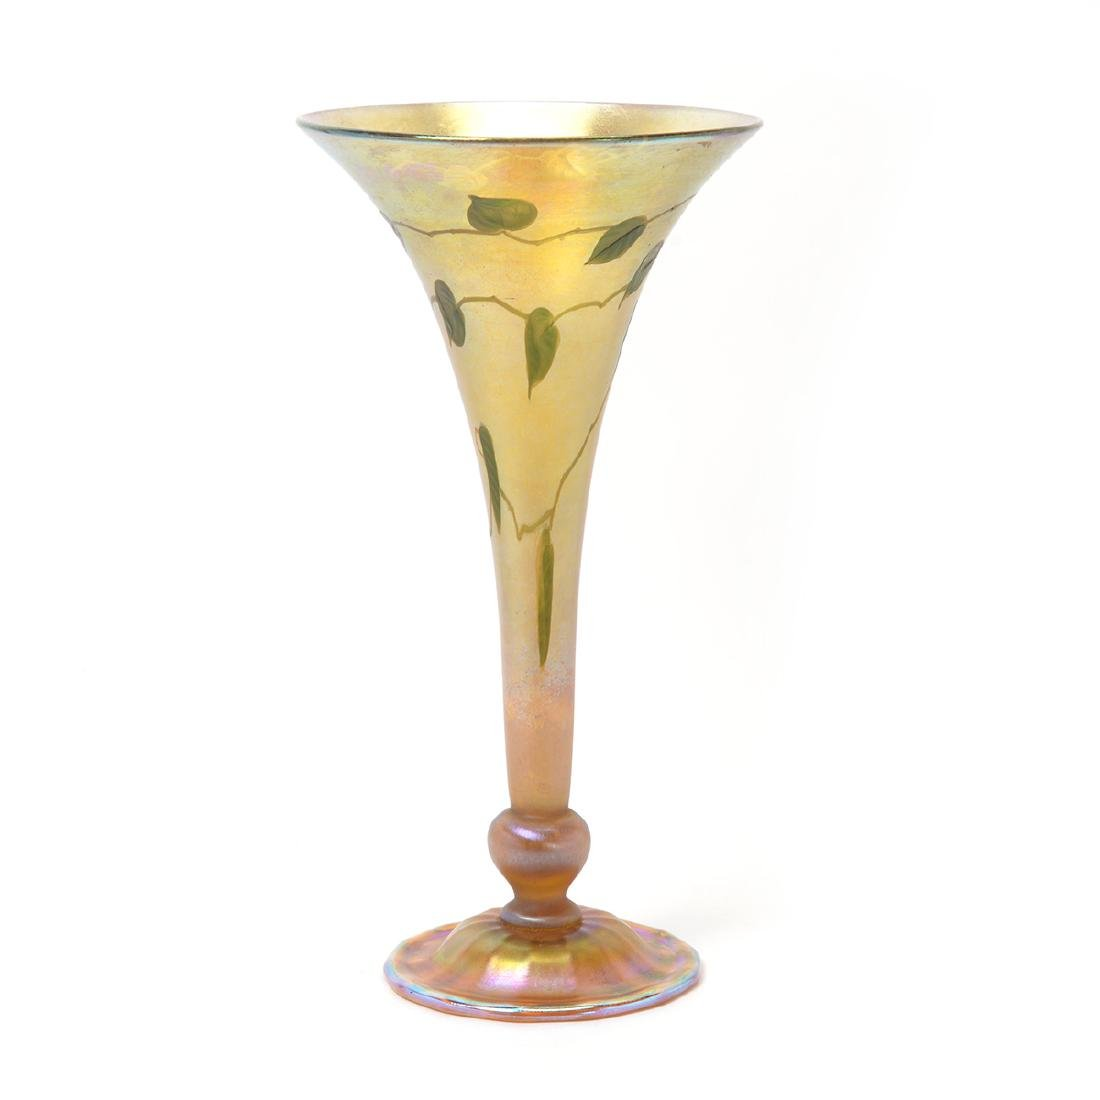 Tiffany Studios Ivy Cut Favrile Trumpet Vase